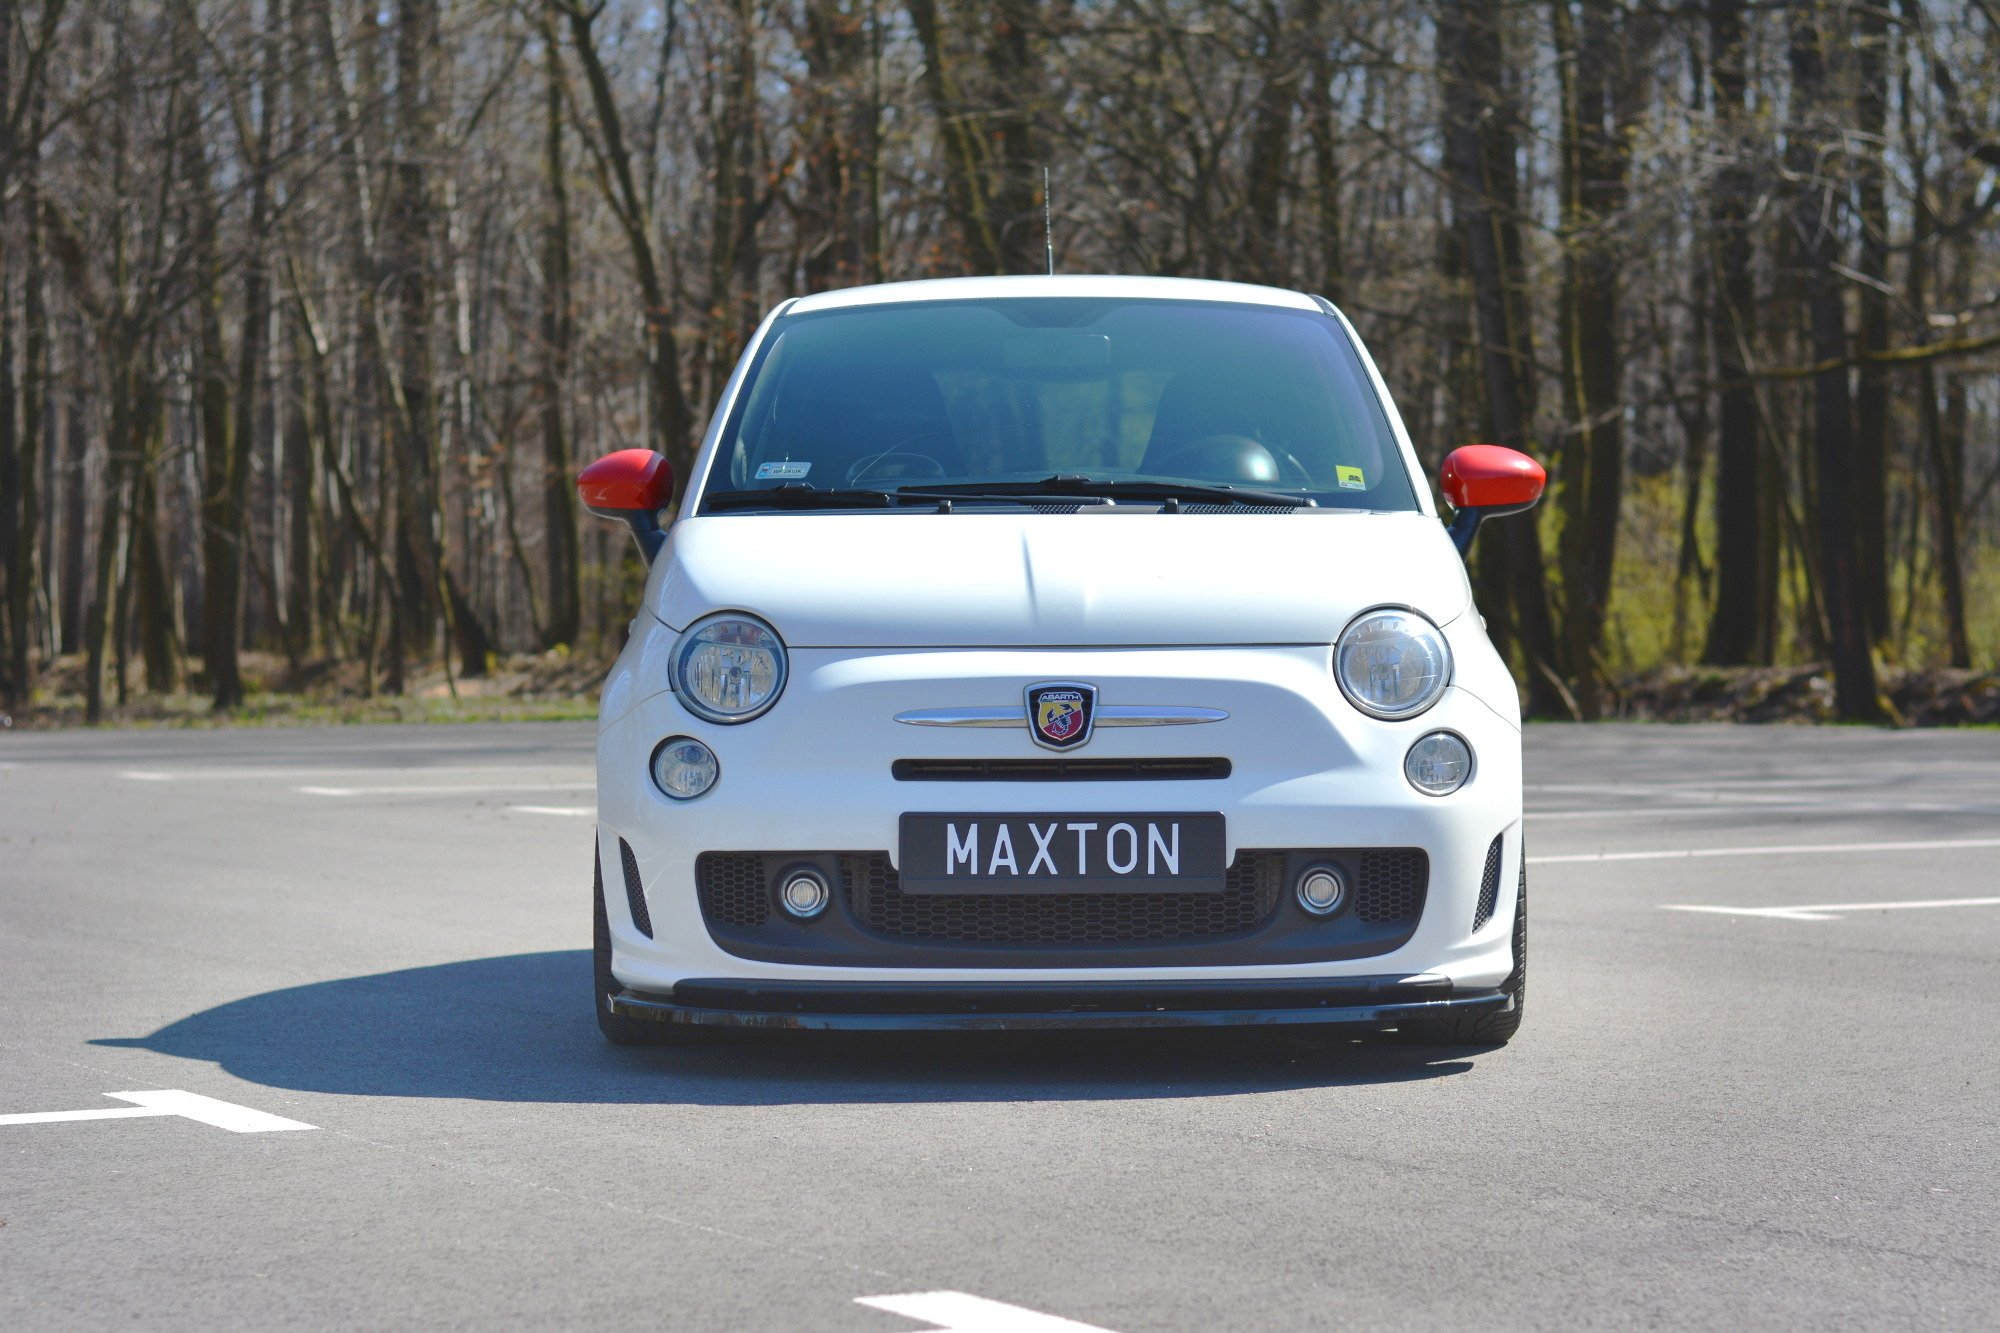 Front Splitter V 2 Fiat 500 Abarth Mk1 Textured Our Offer Fiat 500 Abarth Mk1 Maxton Design